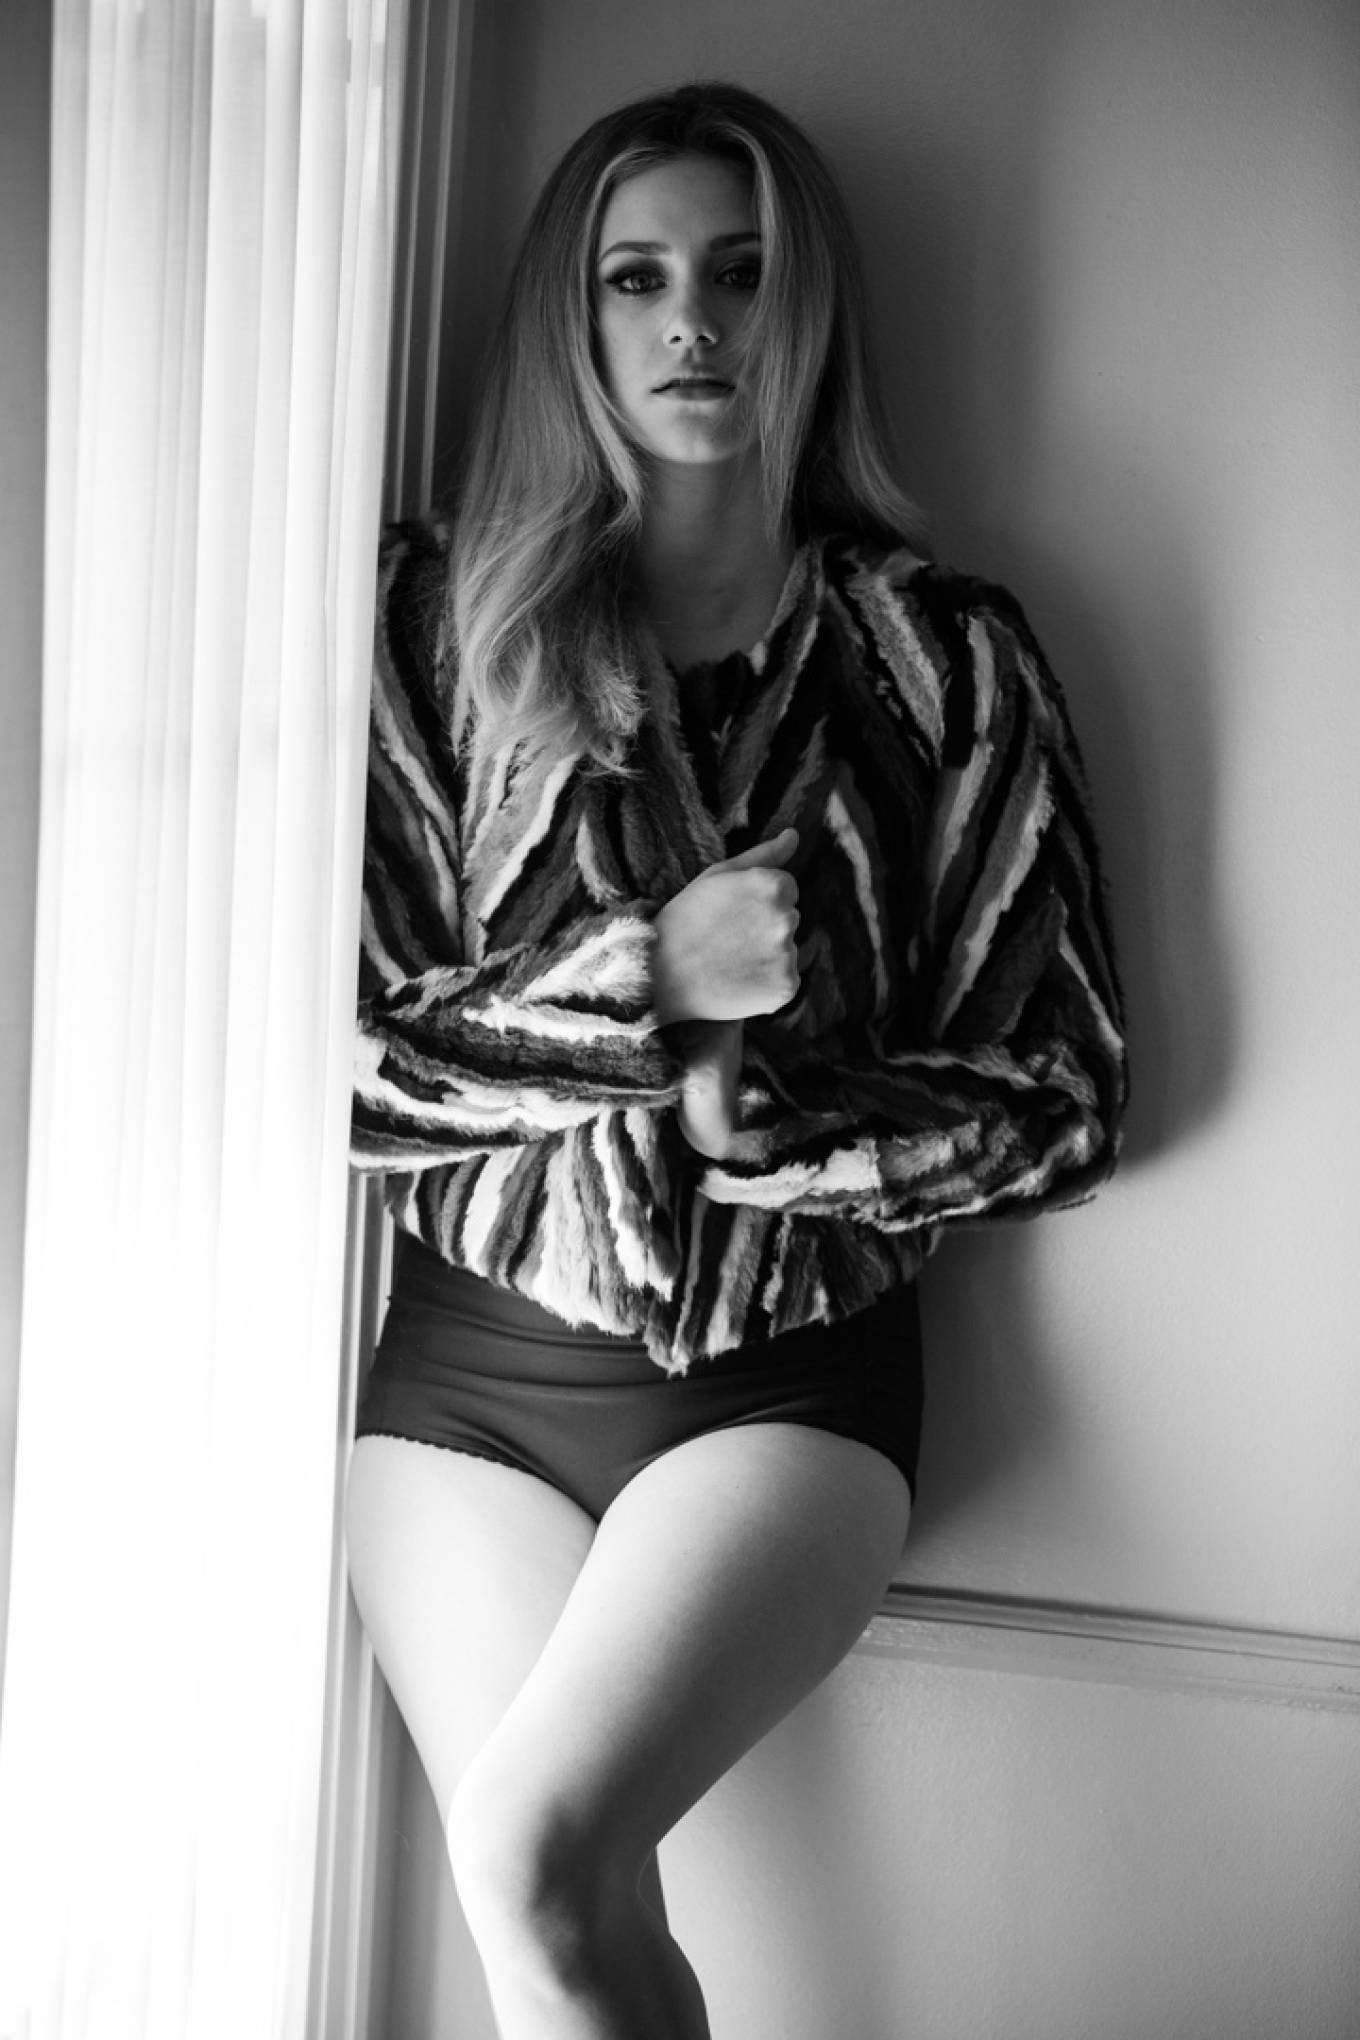 Lili Reinhart 2020 : Lili Reinhart – Ramona Rosales Photoshoot 2016-11